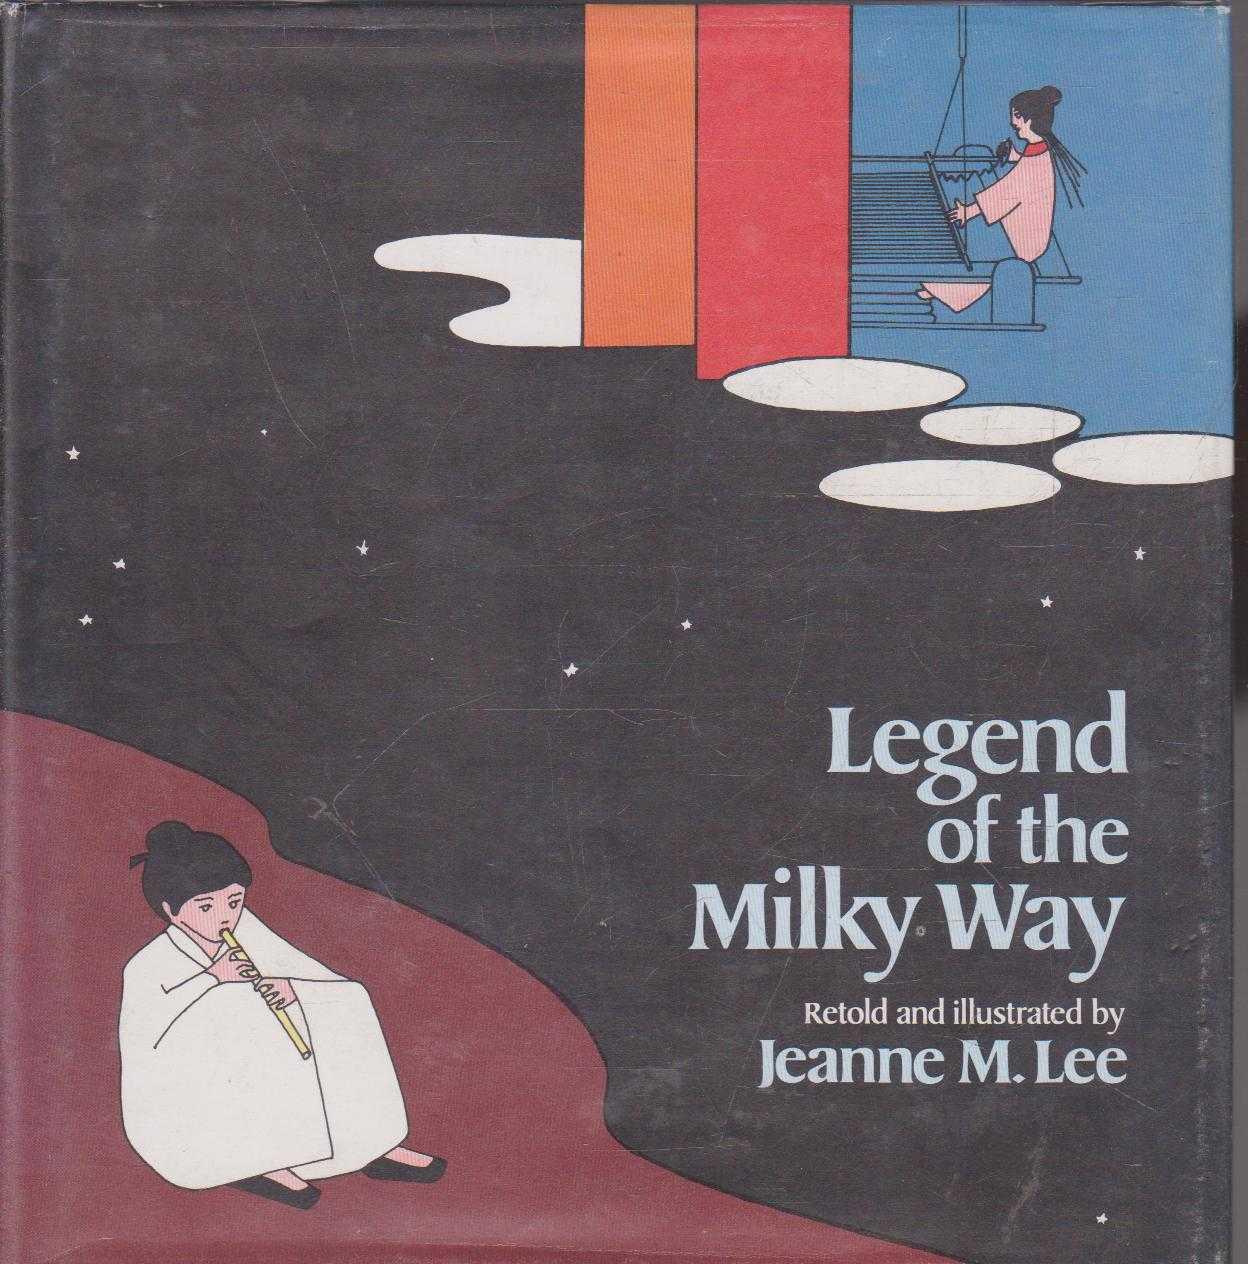 Legend of the Milky Way, Jeanne M. Lee